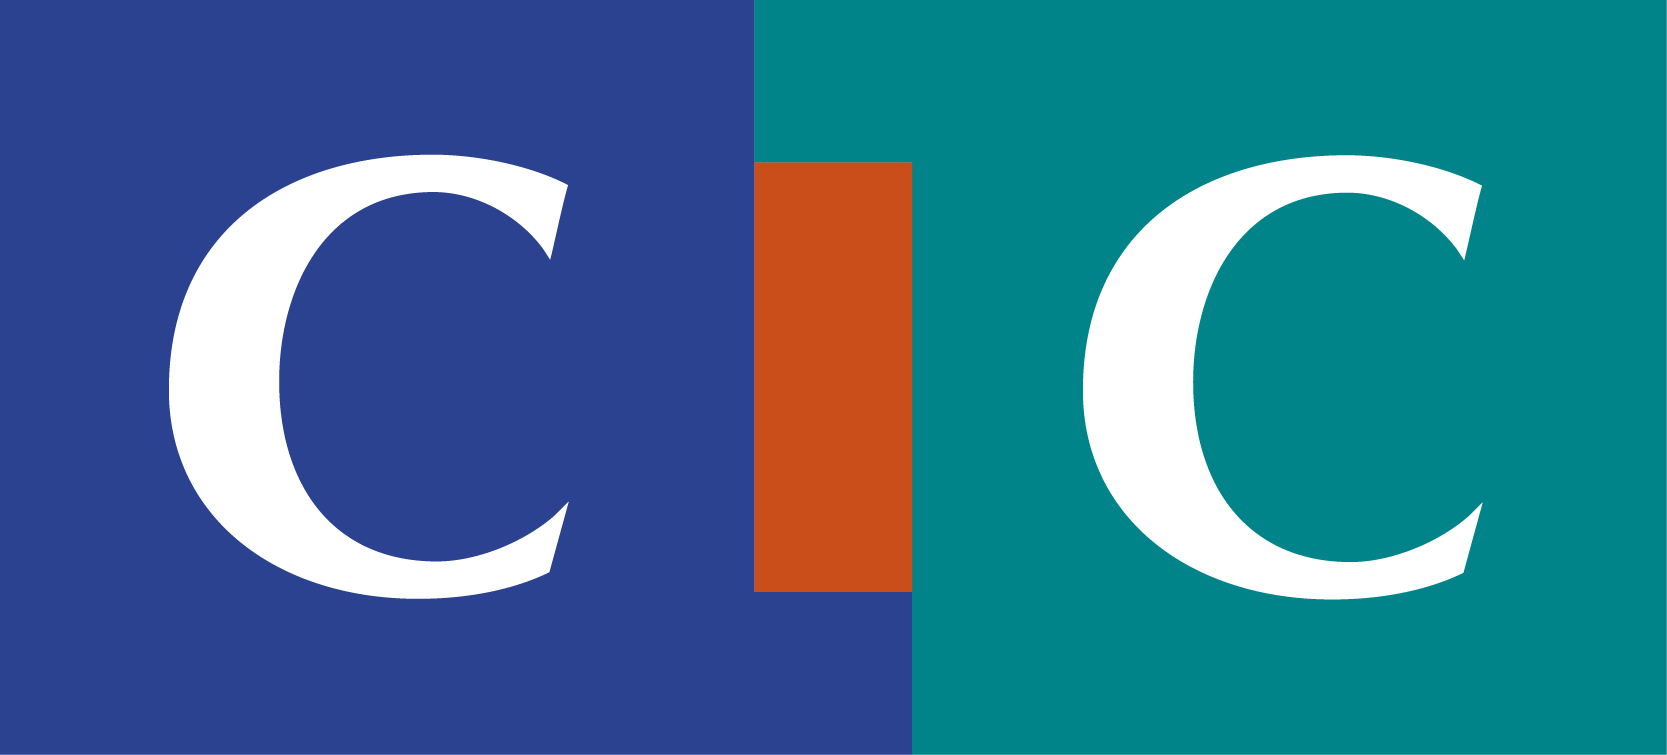 CIC Logo [Credit Industriel et Commercial] png